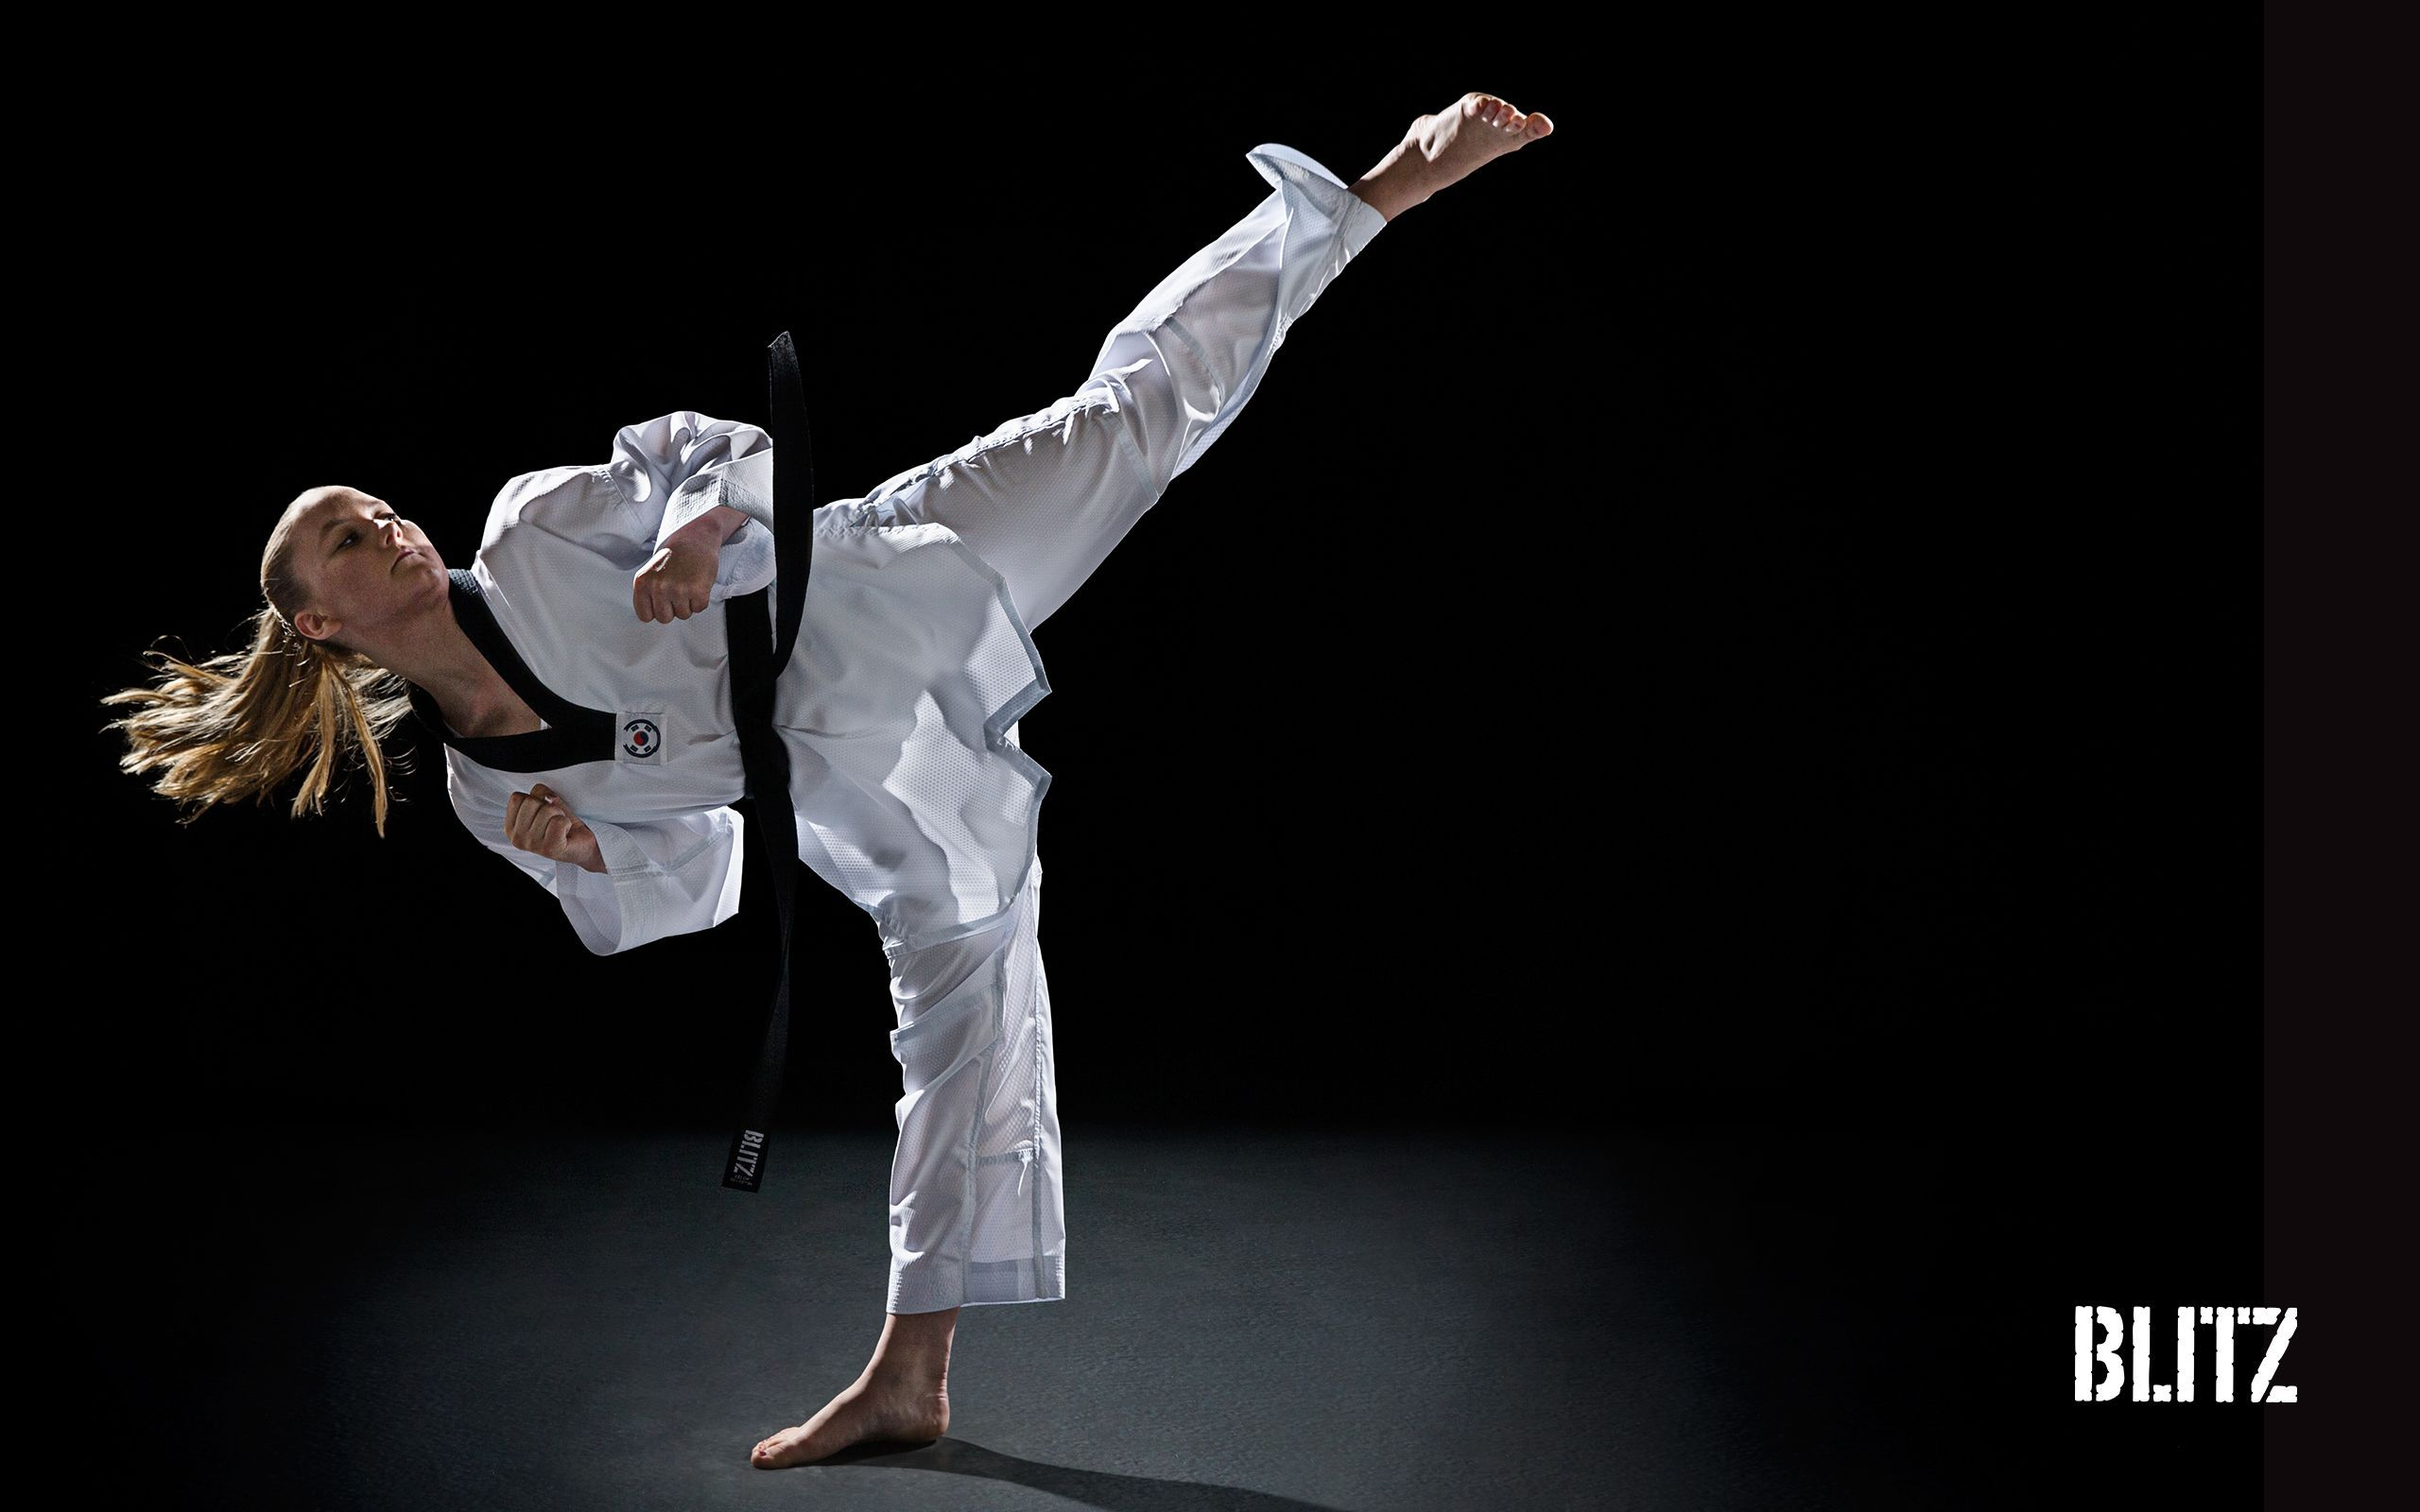 Funny Taekwondo Wallpapers   Top Funny Taekwondo Backgrounds 2560x1600